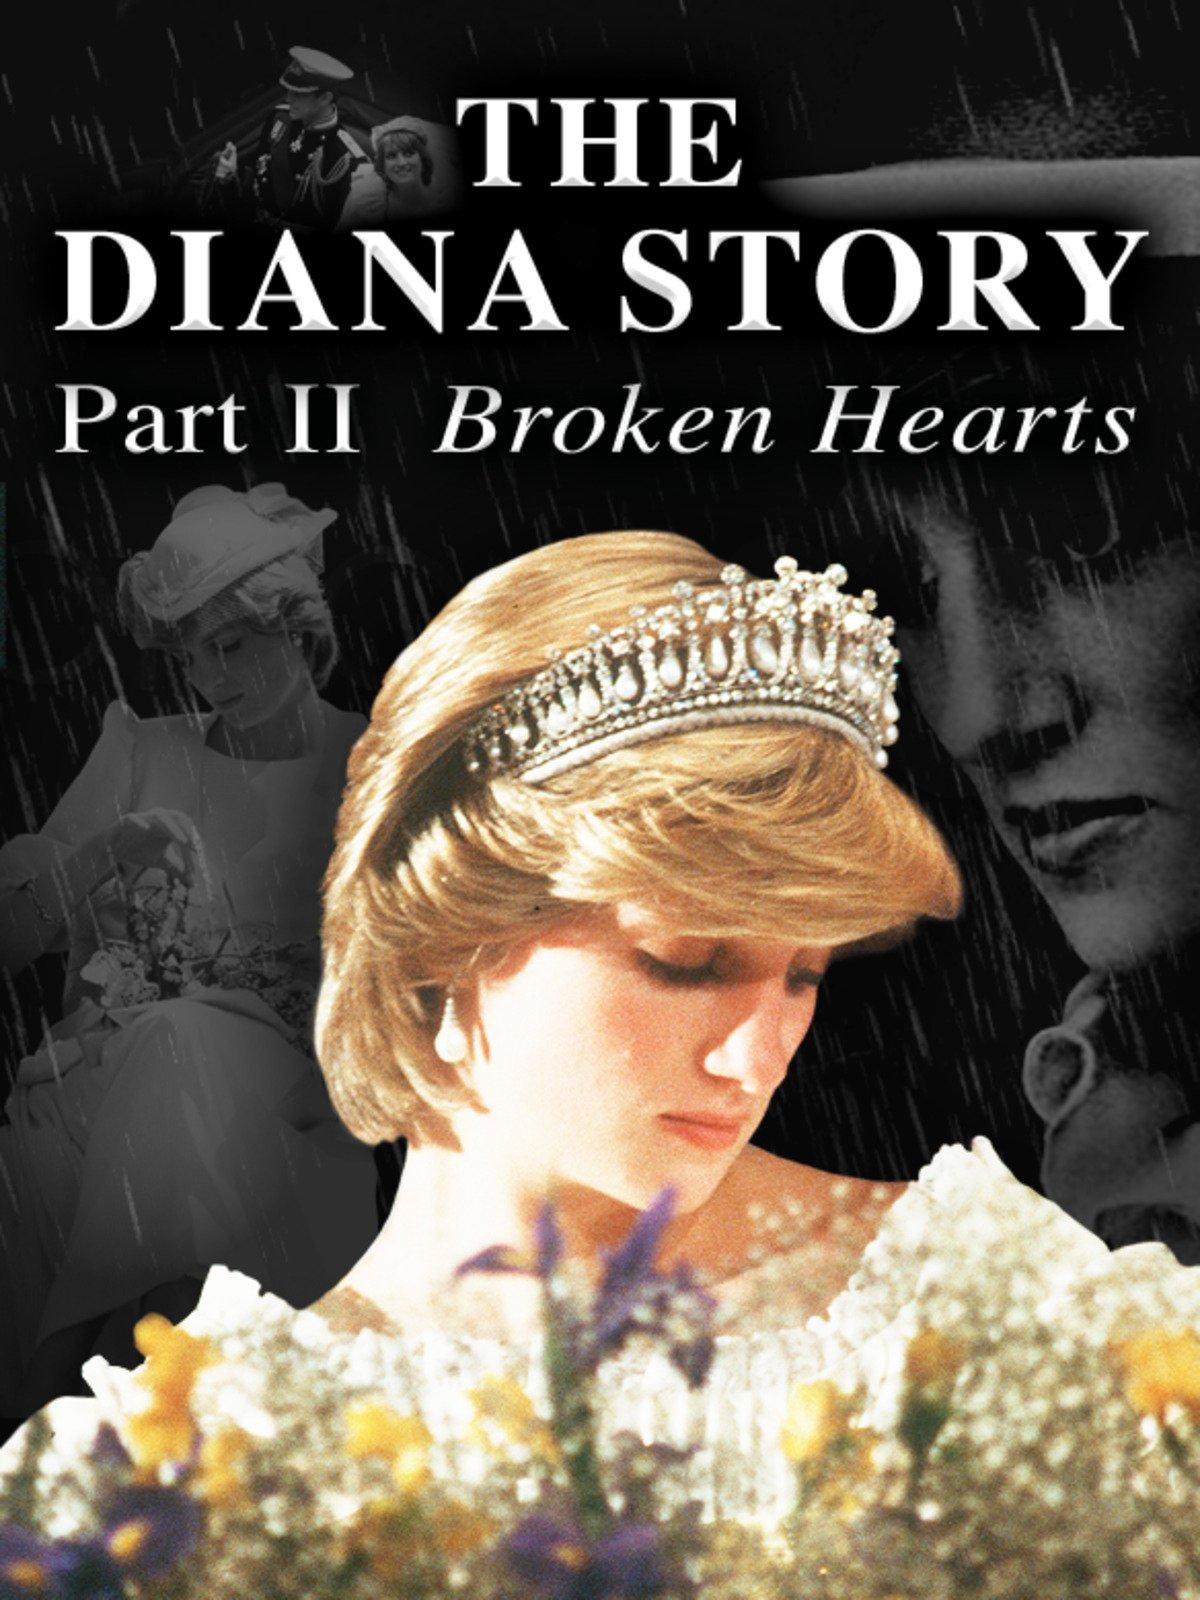 The Diana Story: Part II: Broken Hearts